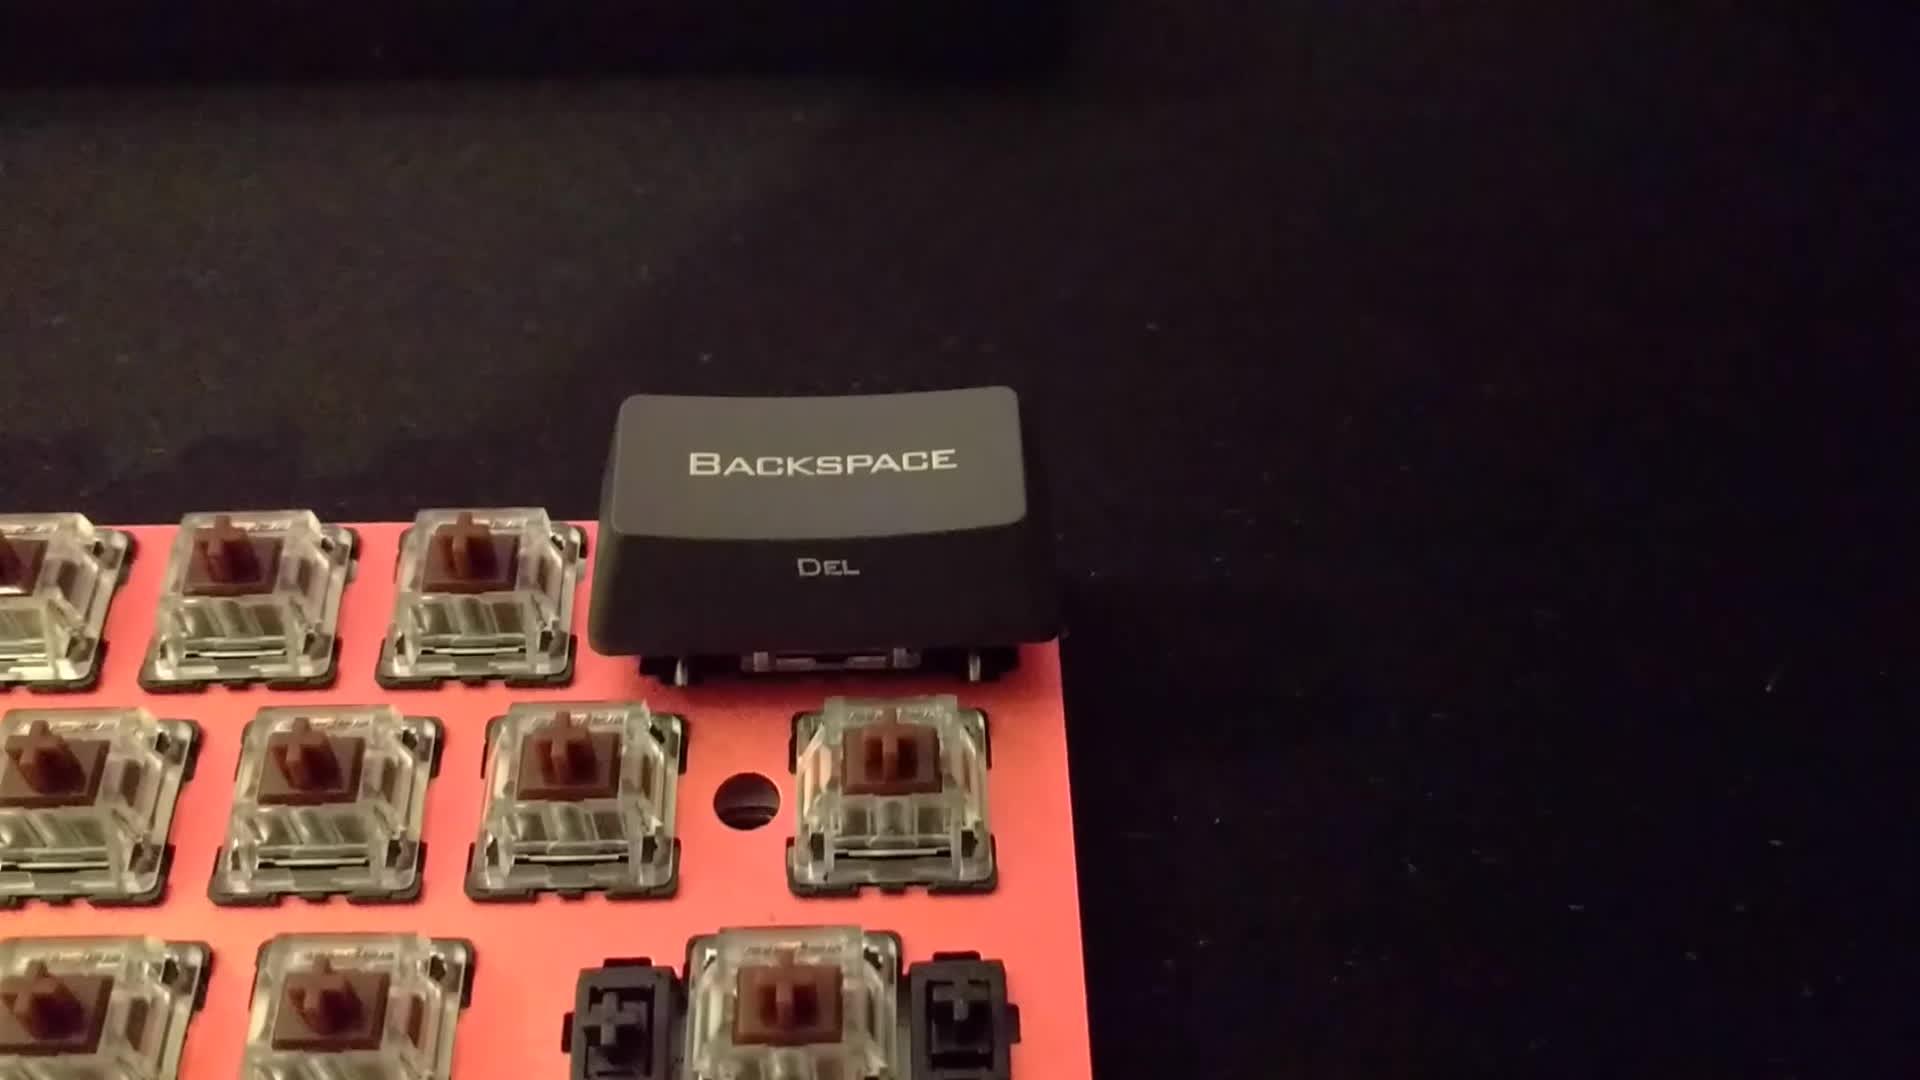 MechanicalKeyboards, New PCB Poker Backspace GIFs